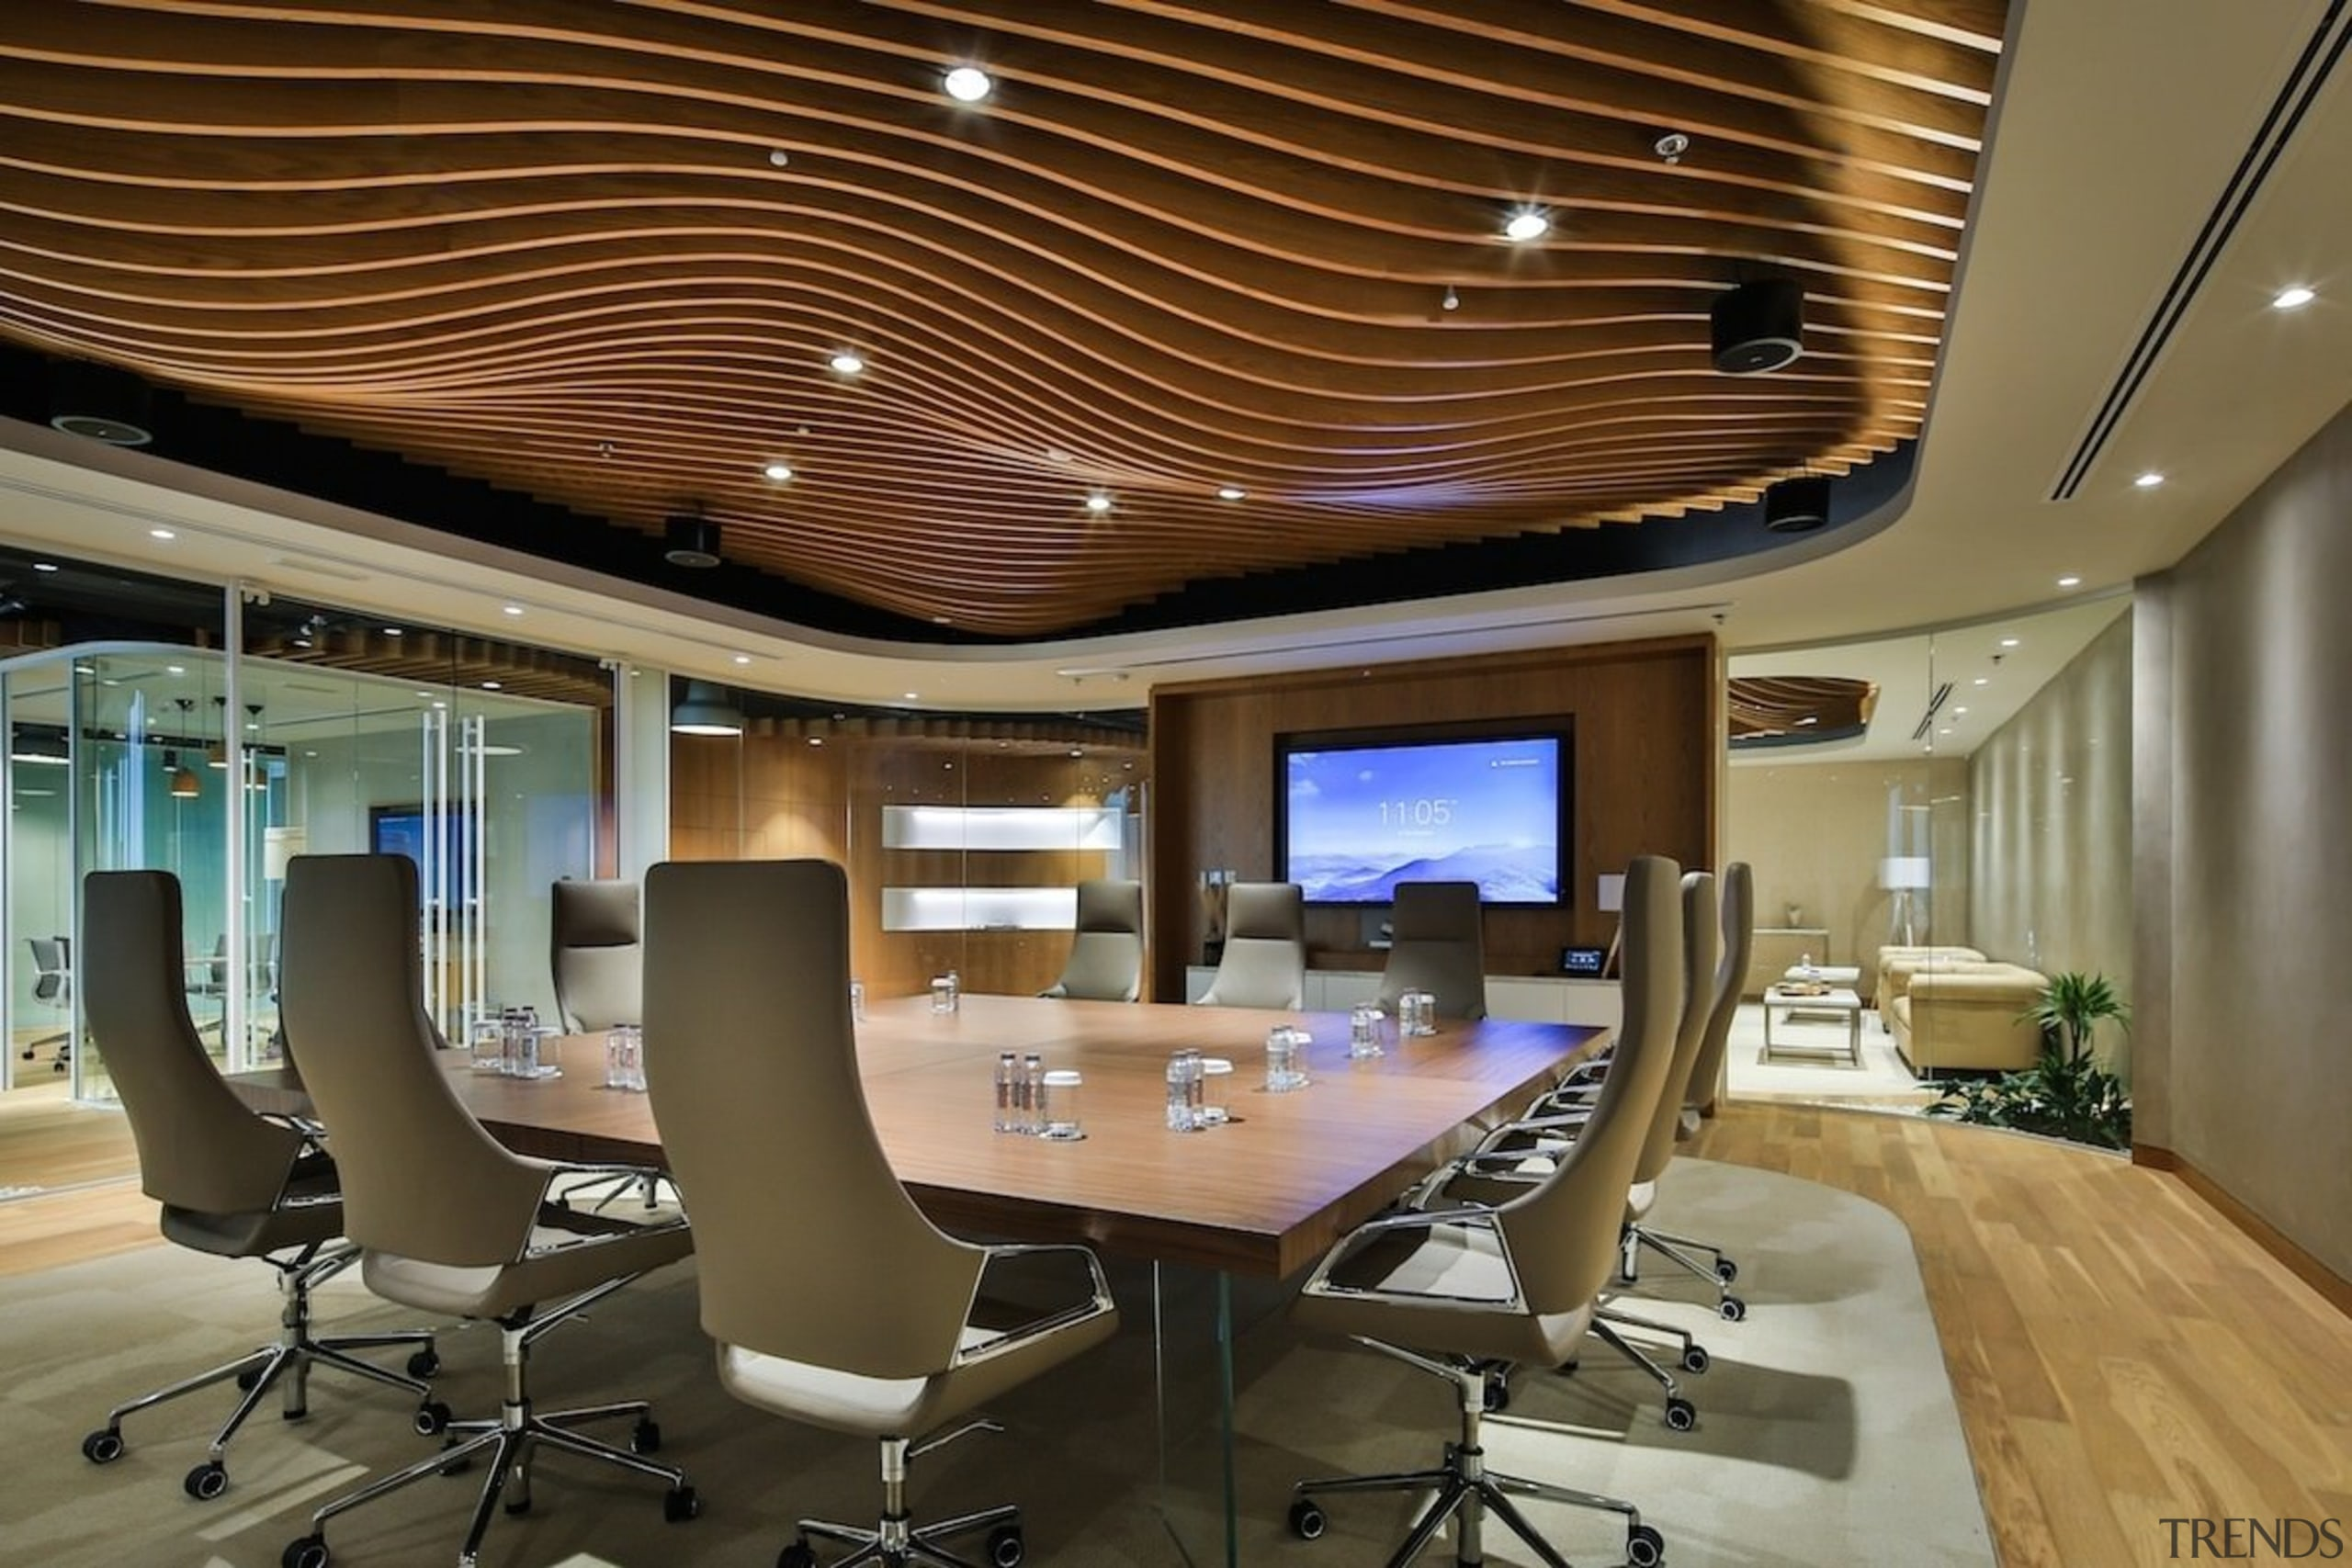 Smart Dubai - Smart Dubai - ceiling | ceiling, conference hall, interior design, office, brown